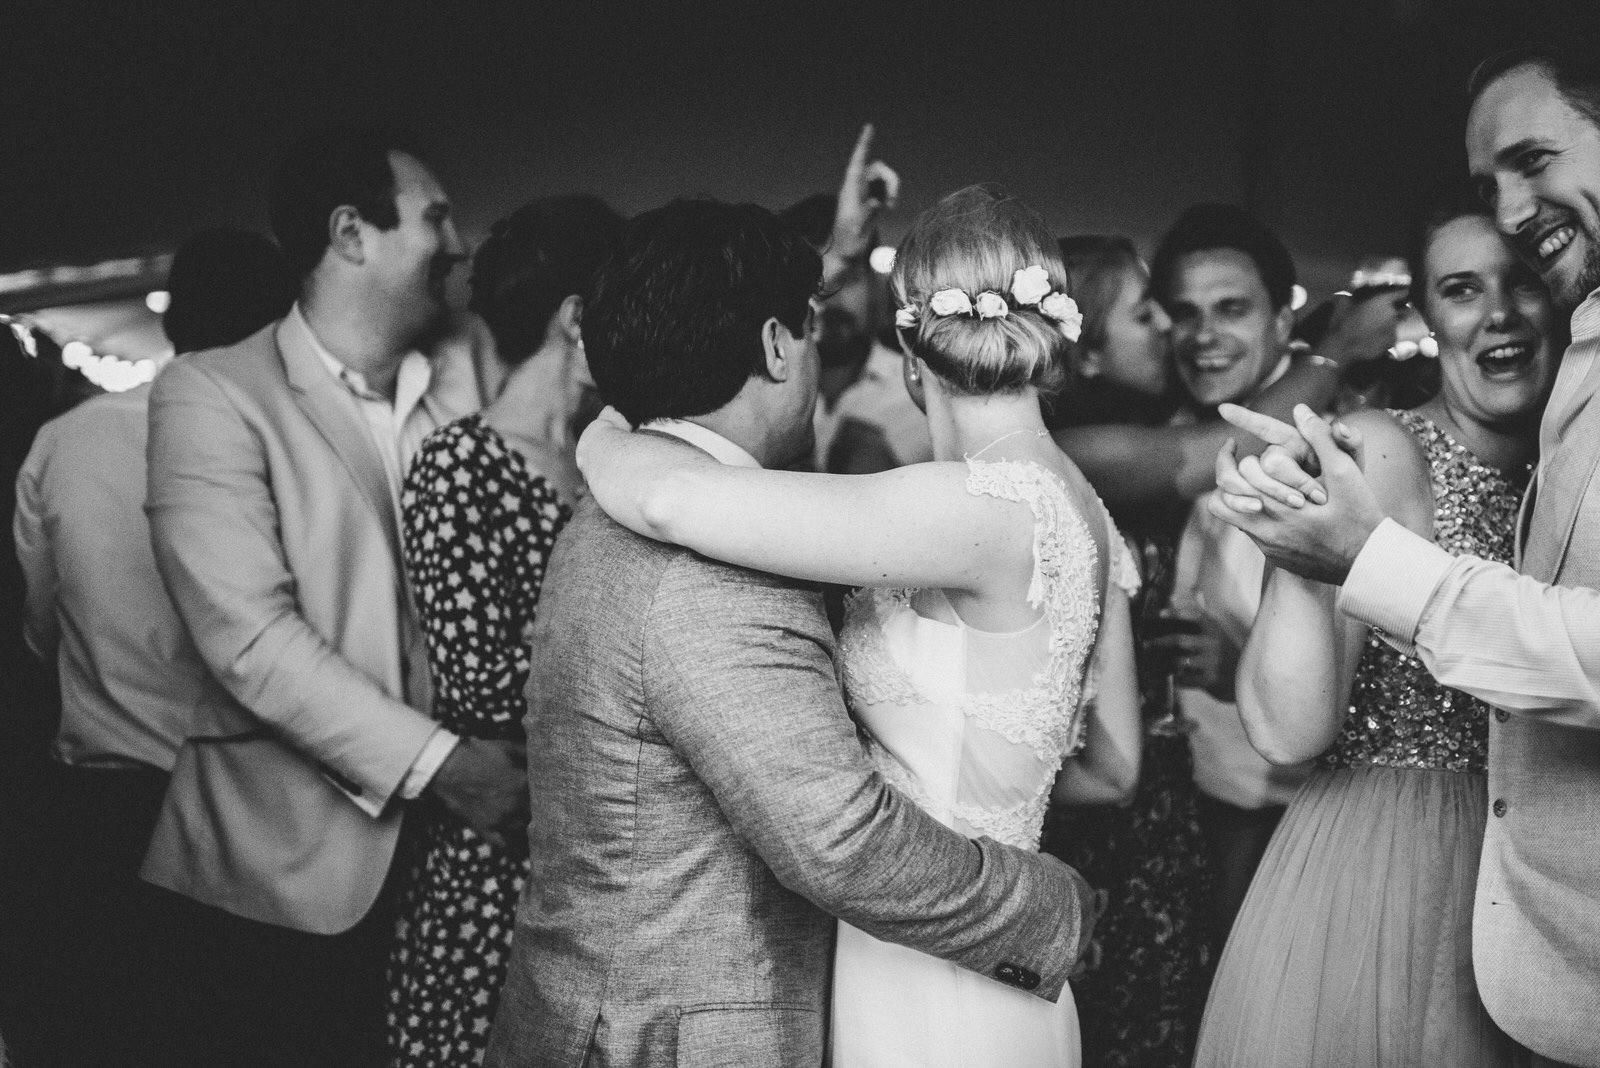 042-LOURMARIN-WEDDING-PHOTOGRAPHER-PROVENCE-WEDDING-ALTERNATIVE-WEDDING-PHOTOGRAPHY-FRANCE-PROVENCE-GARDEN-WEDDING.JPG